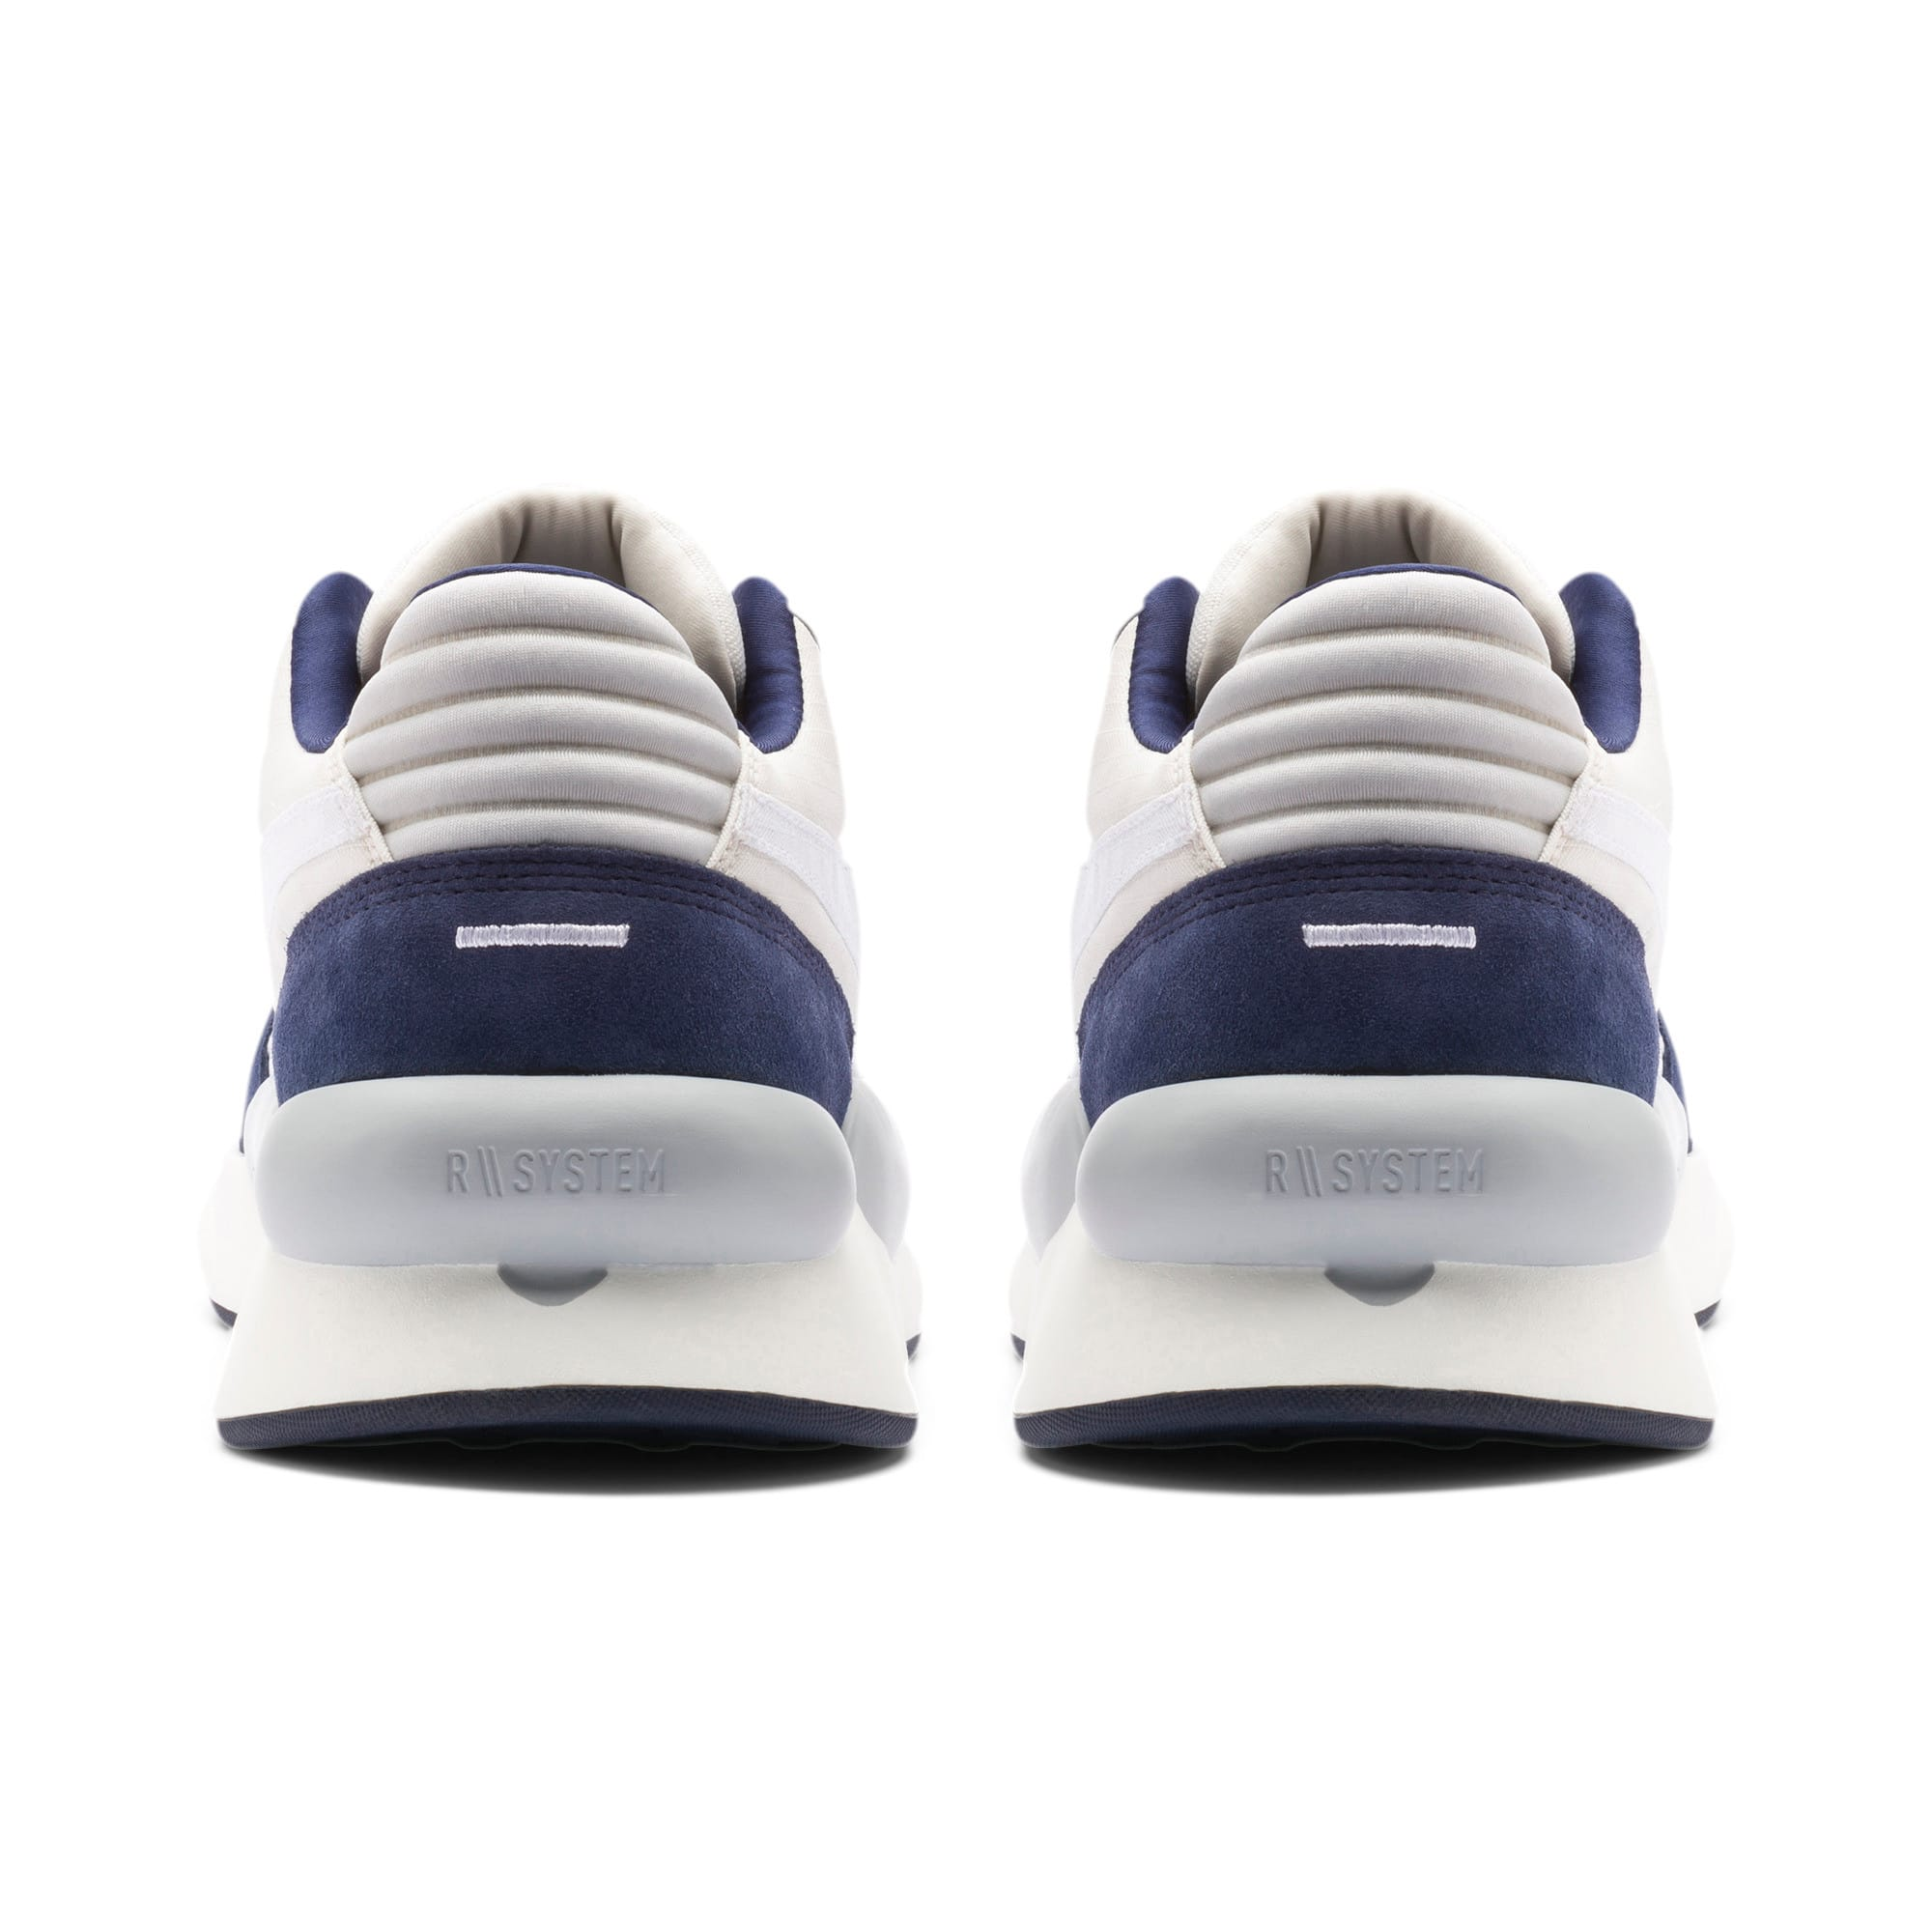 Thumbnail 3 of RS 9.8 Space Sneakers, Whisper White-Peacoat, medium